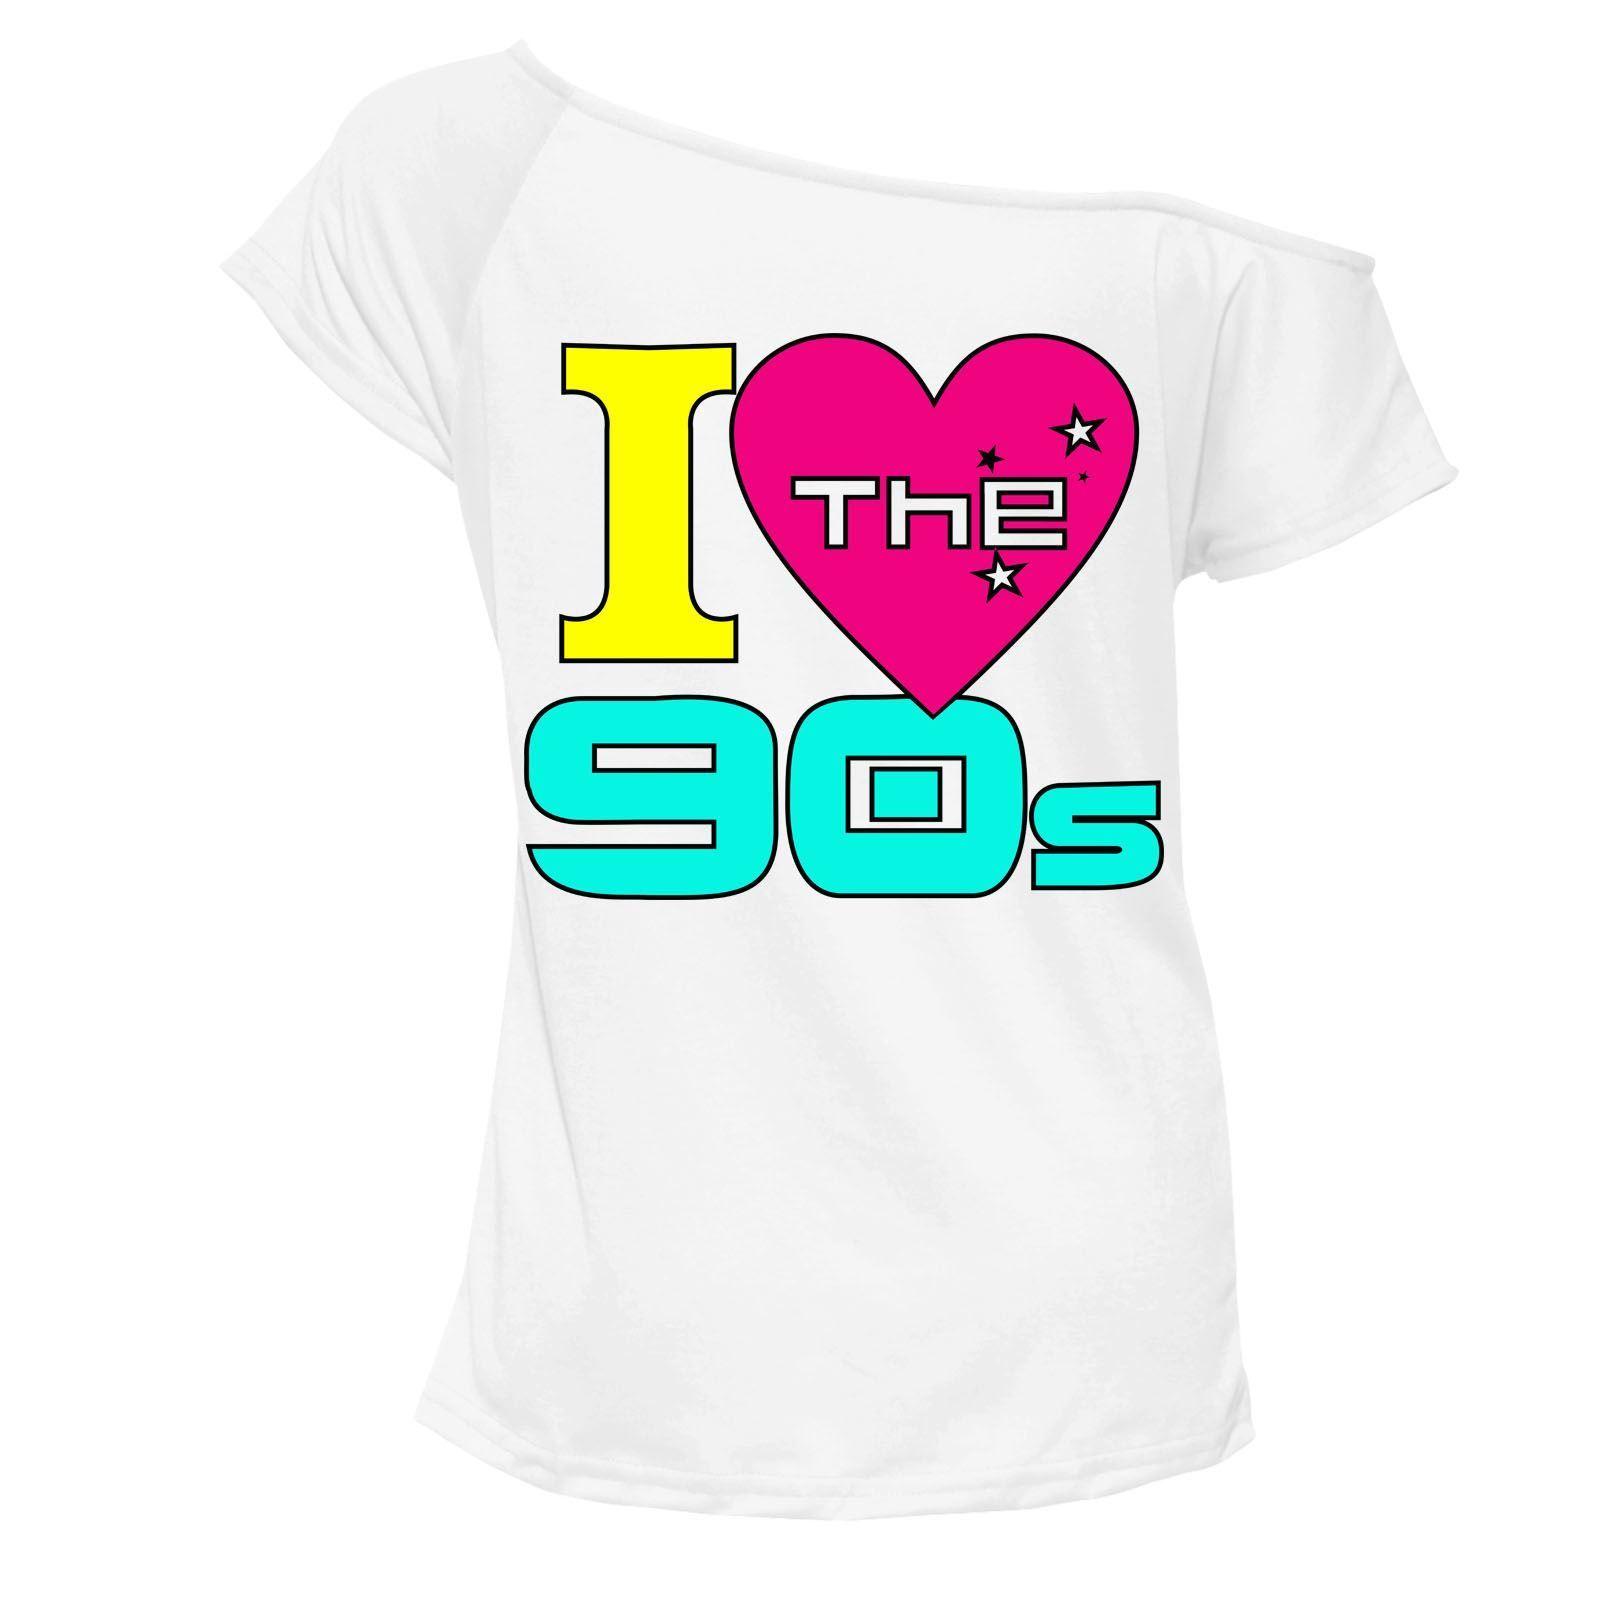 ee37f0a9 We Love 90s Tshirt Top Off Shoulder Pop Retro Hen Party Club